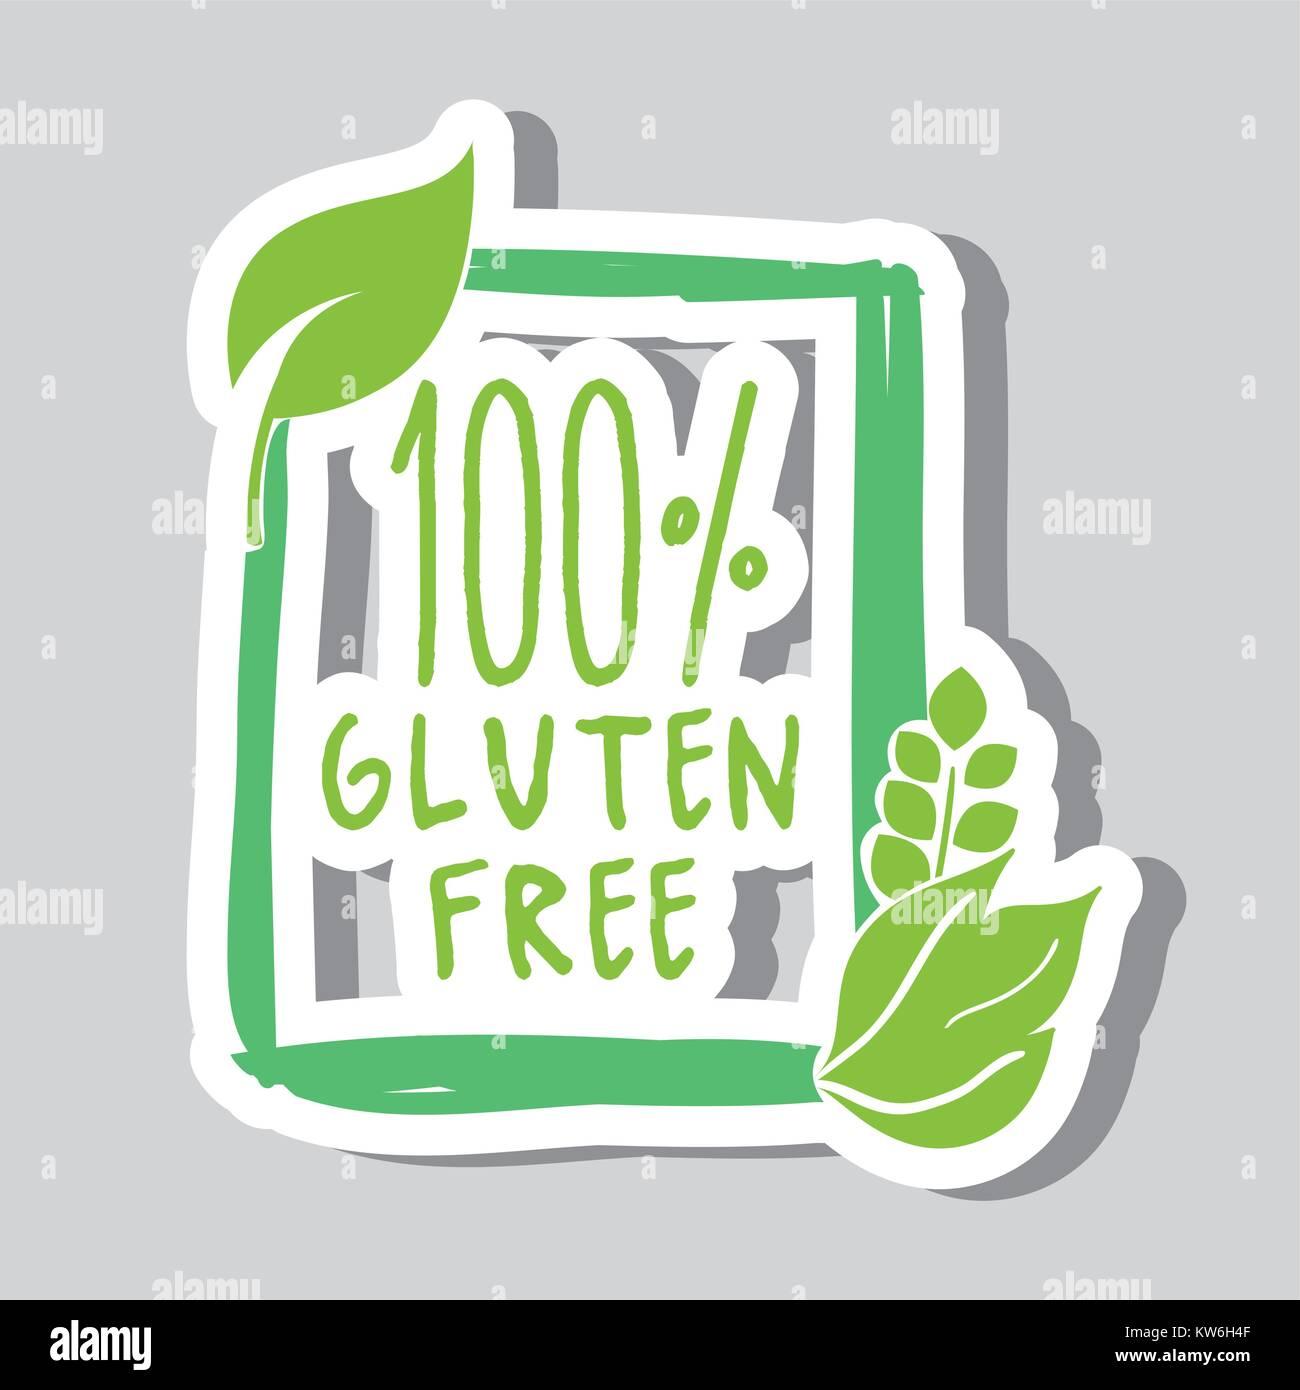 one hundred percent gluten free food vector illustration - Stock Vector